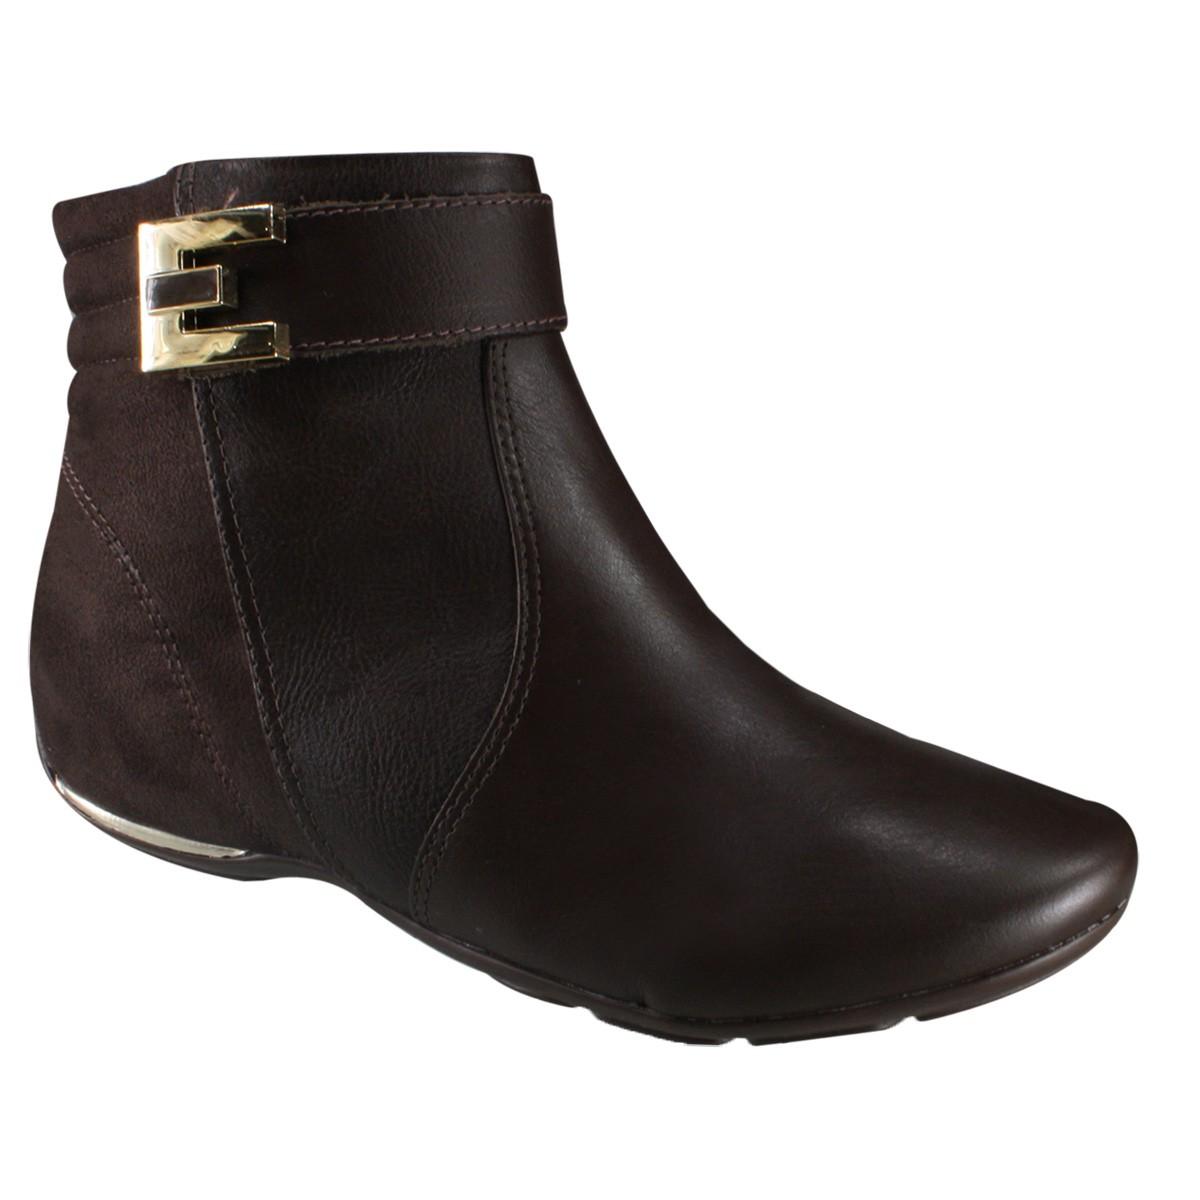 d276eb7d4 Bota Comfortflex Feminina Ankle Boot 17-91301 000011 - Marrom (Soft ...